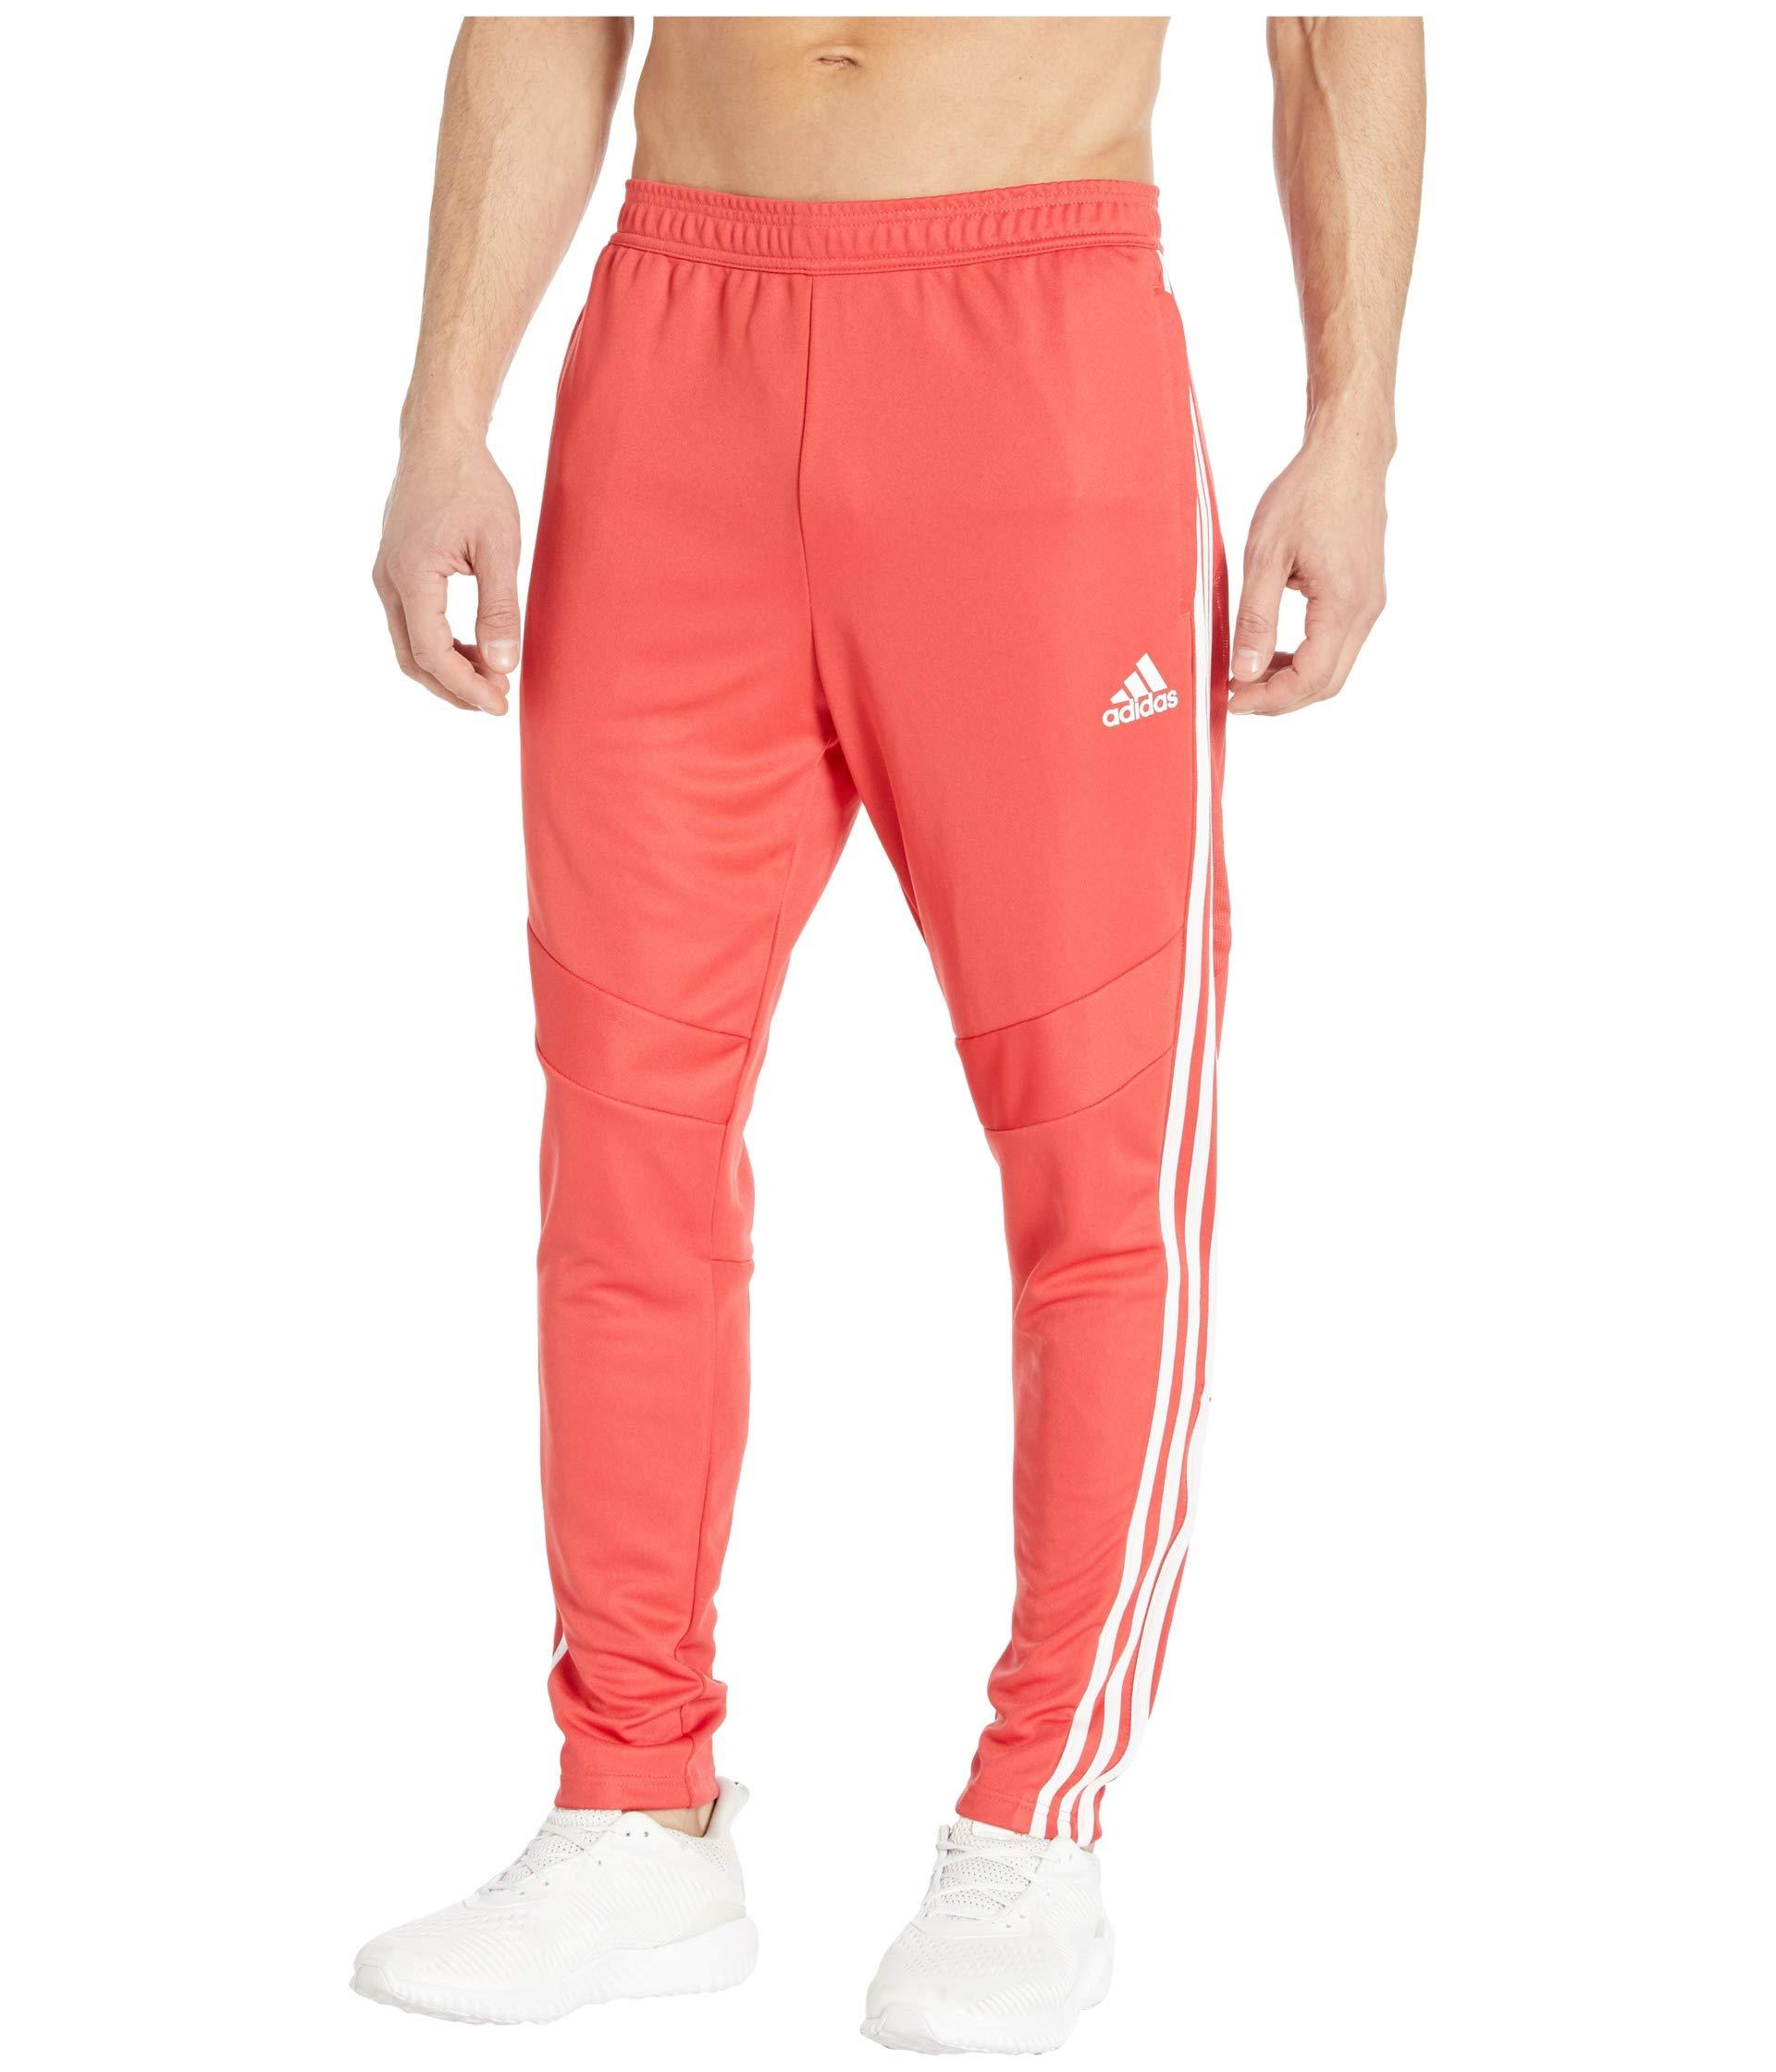 adidas Men's Tiro 19 Pants, Glory Red/White, X-Small